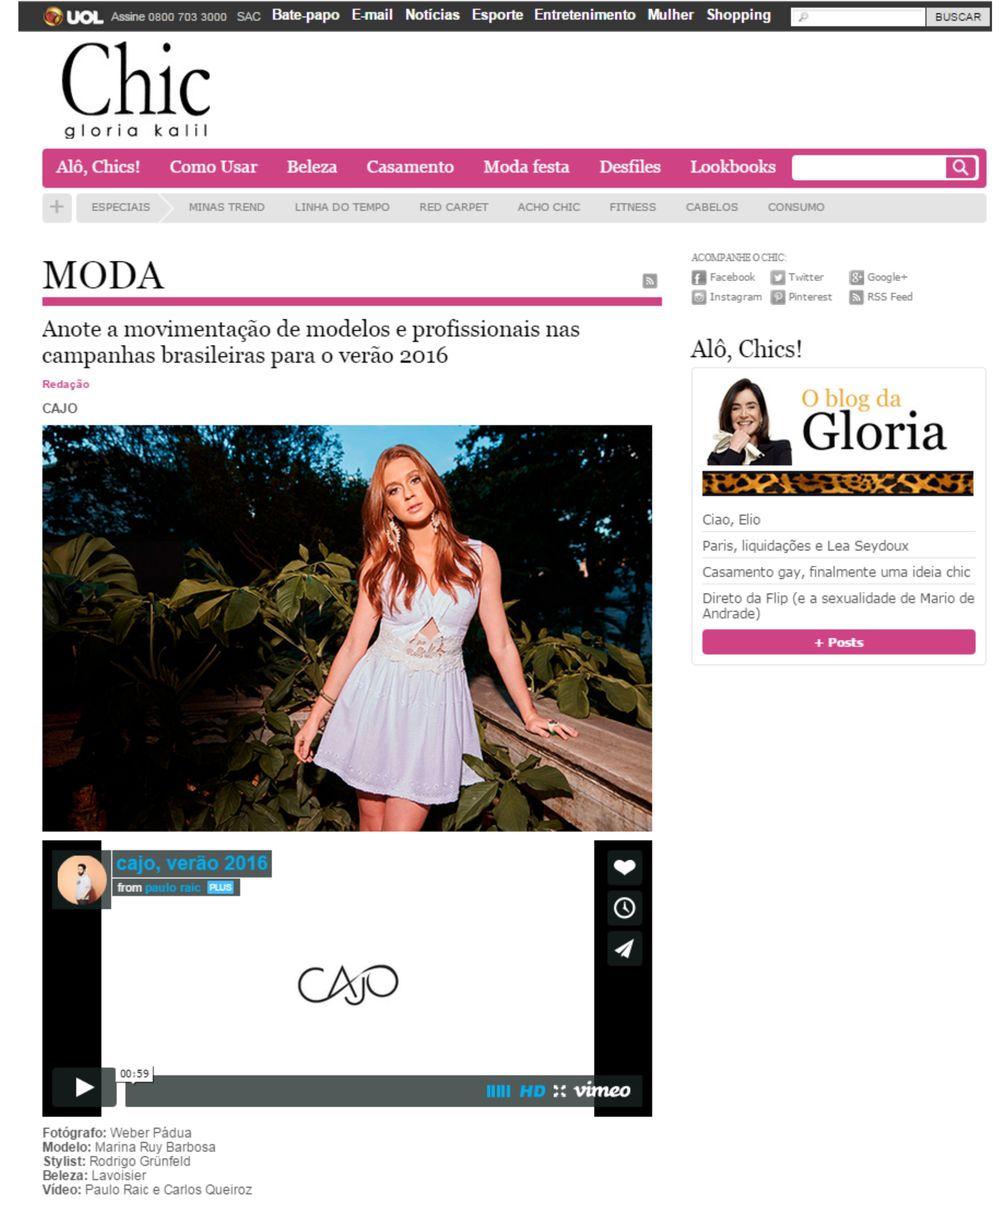 Cajo - Site Chic. UOL - Gloria Kalil - 21-07-2015.jpg